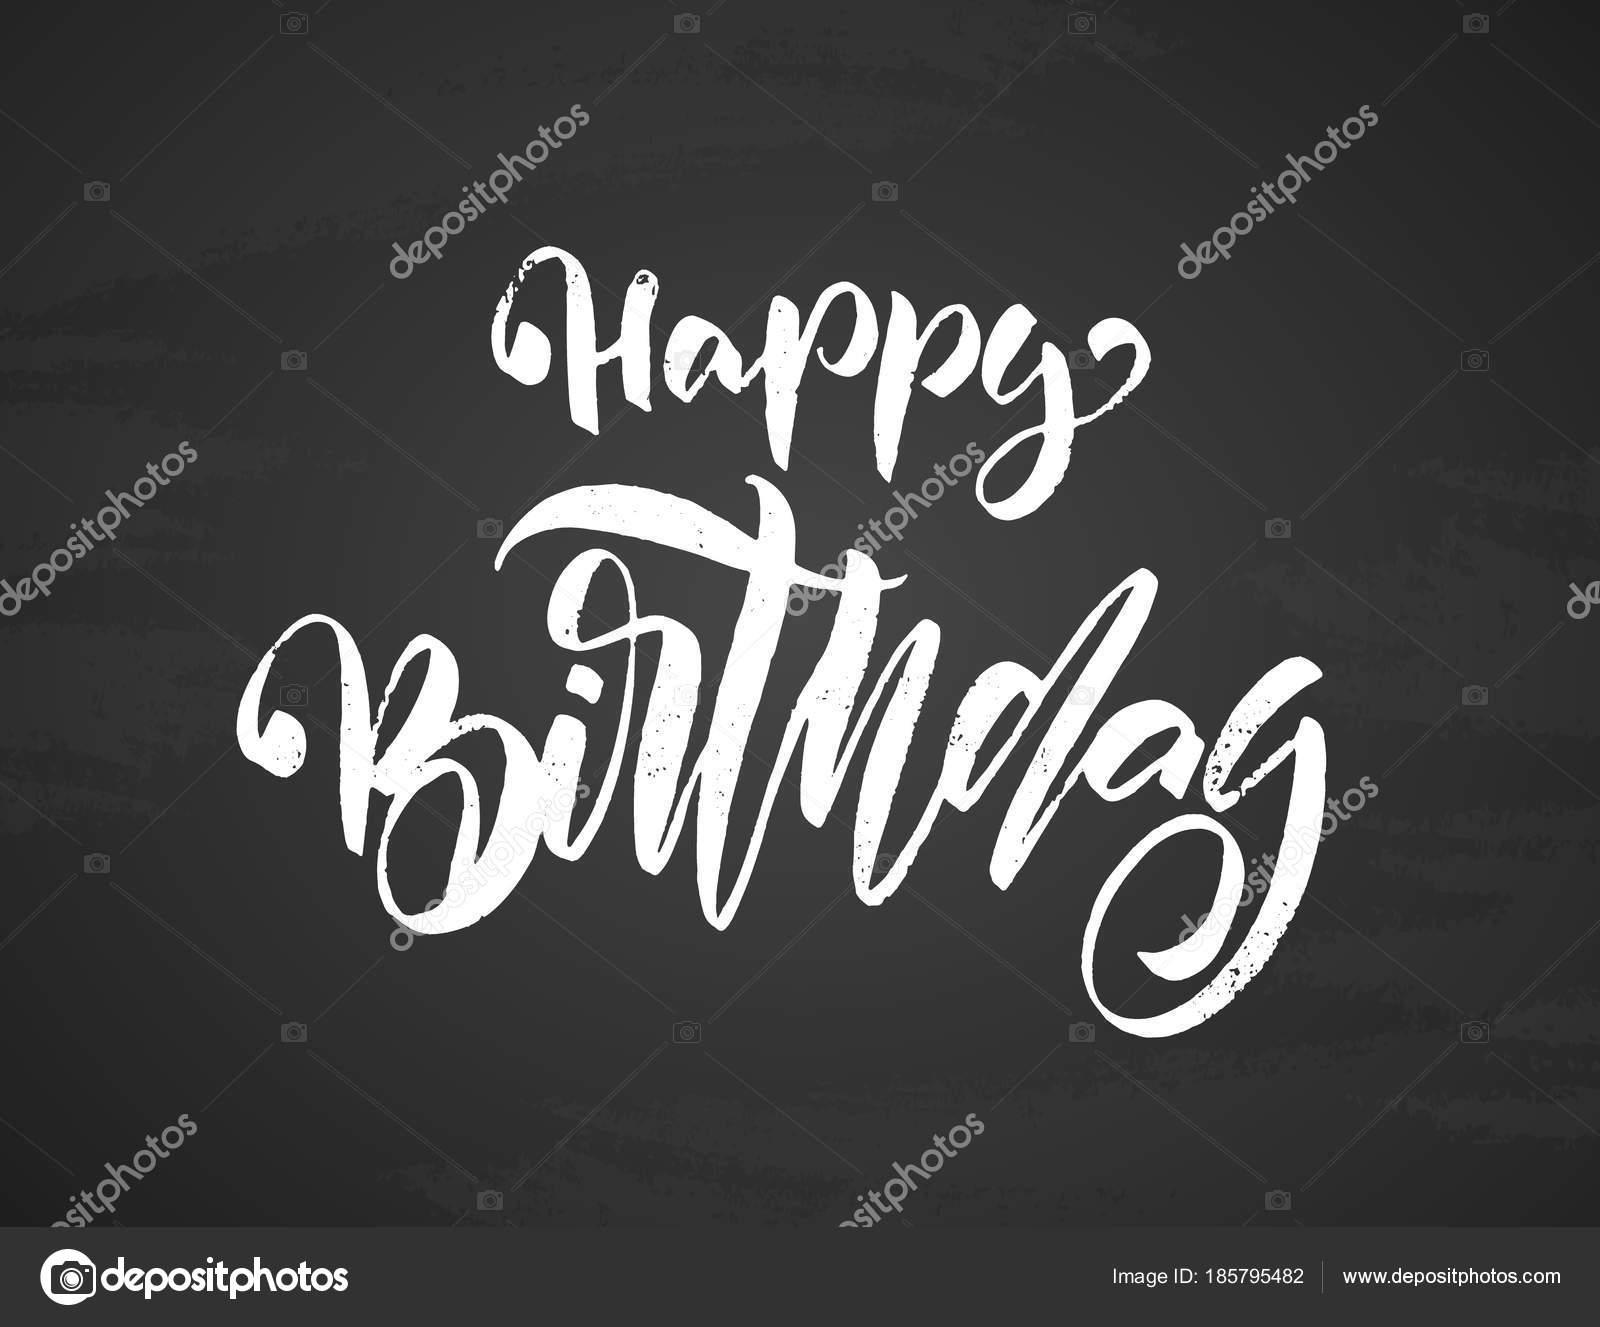 Handwritten Textured Brush Type Lettering Of Happy Birthday On Chalkboard Background Typography Design